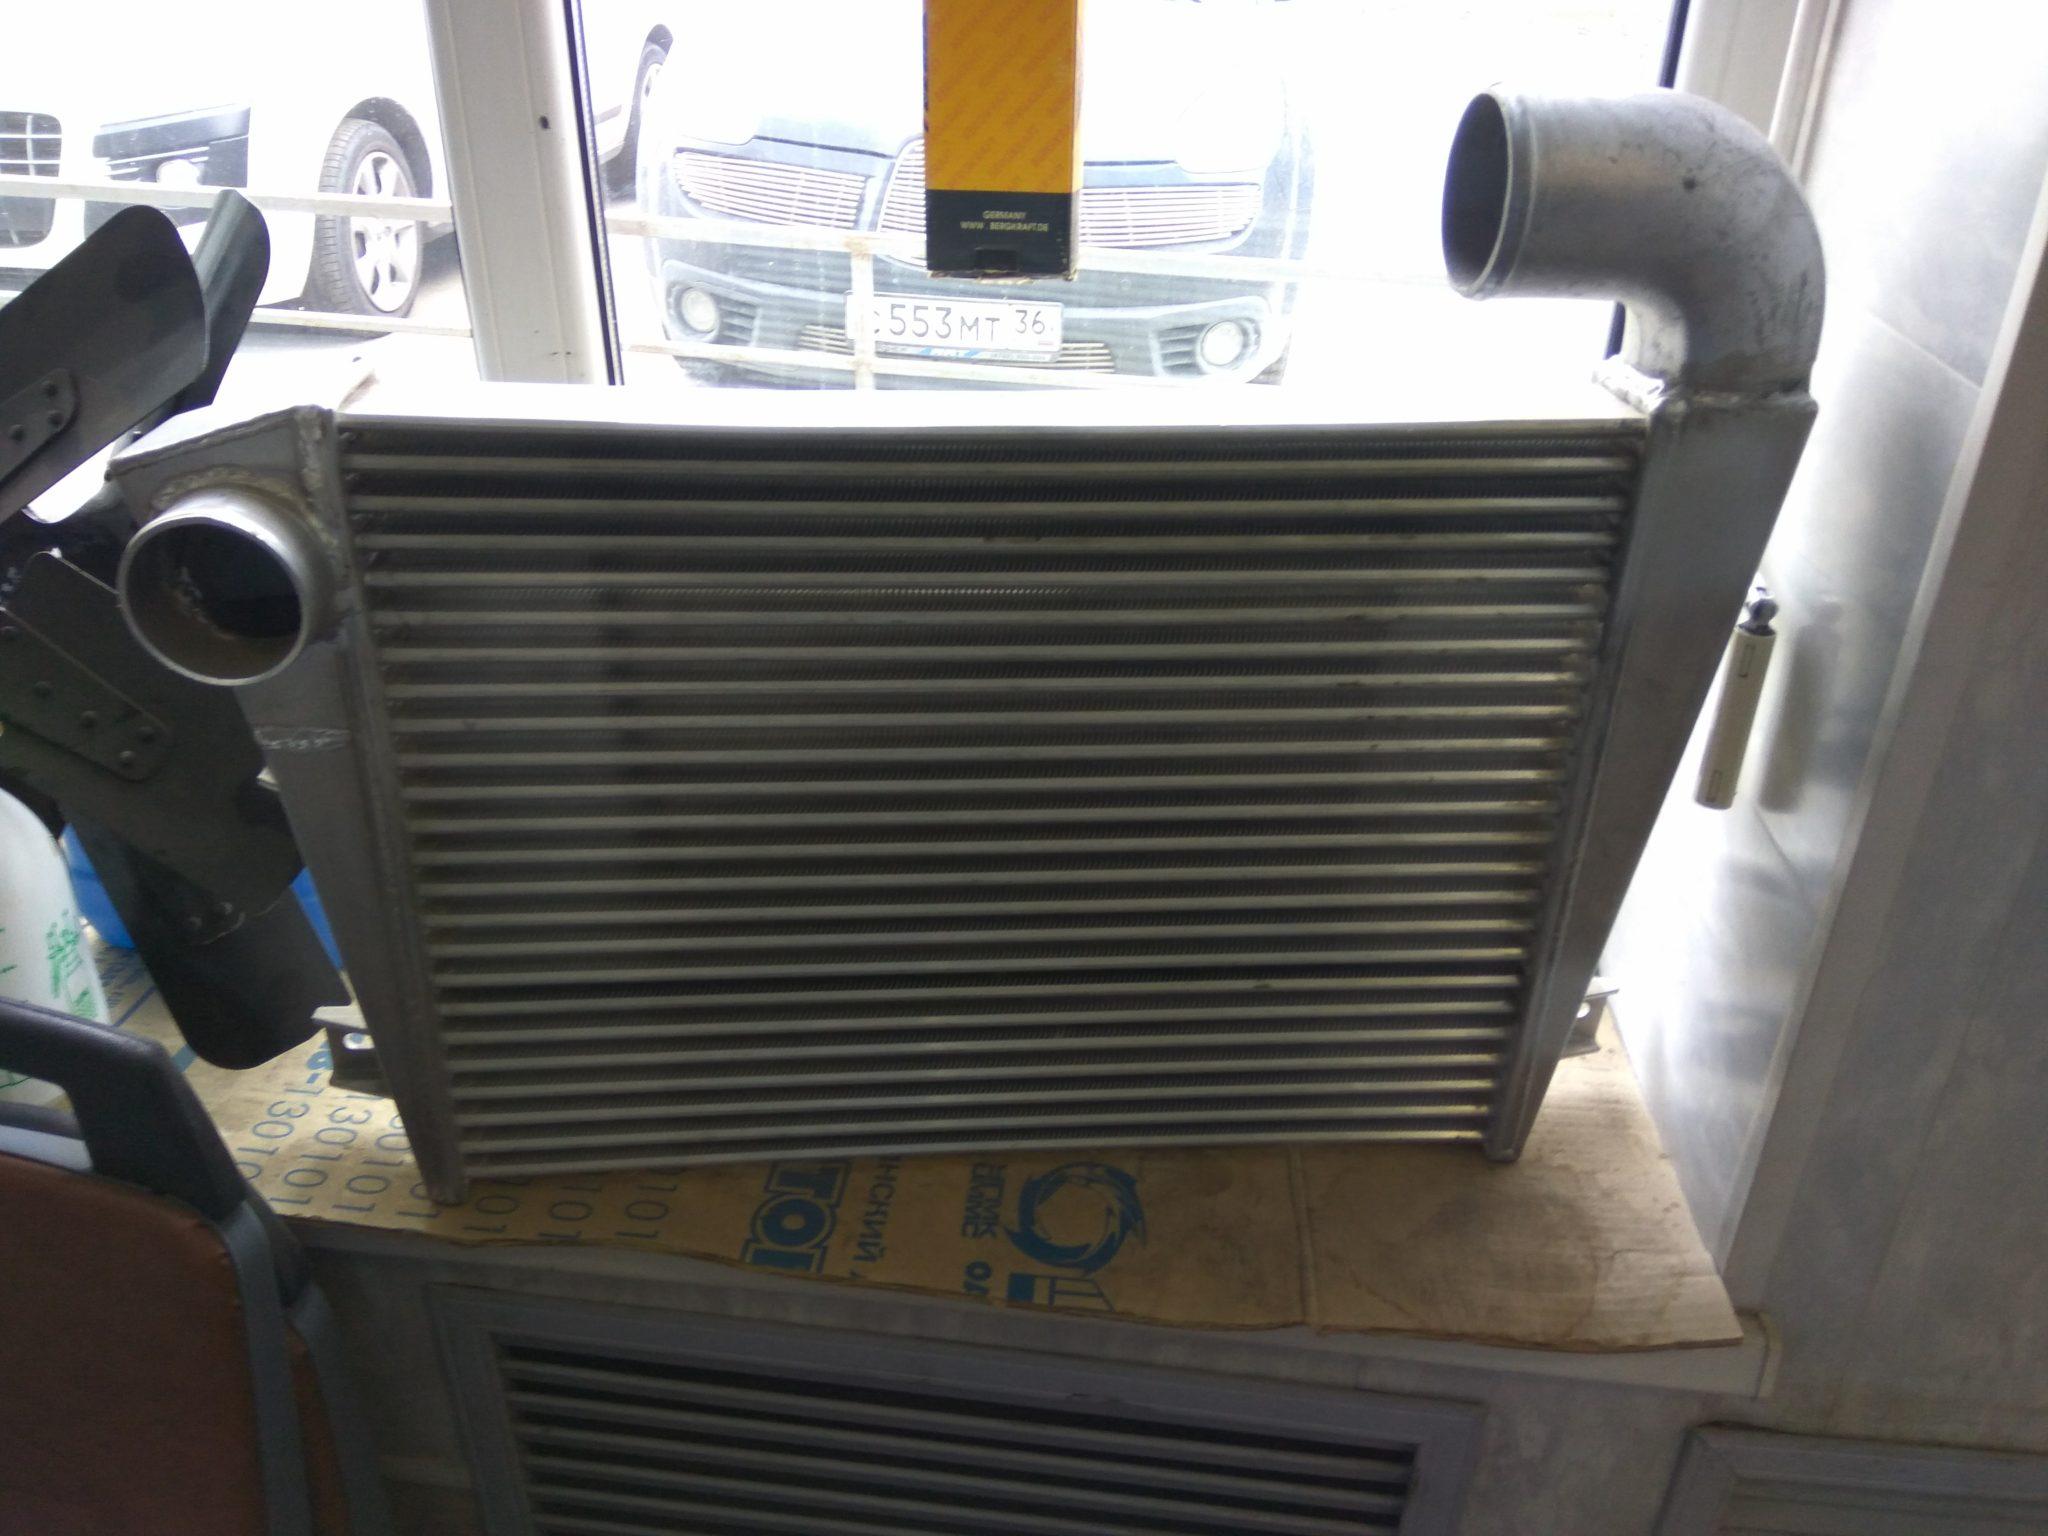 Охладитель ЛиАЗ ЯМЗ 525630-1172003-06 Таспо